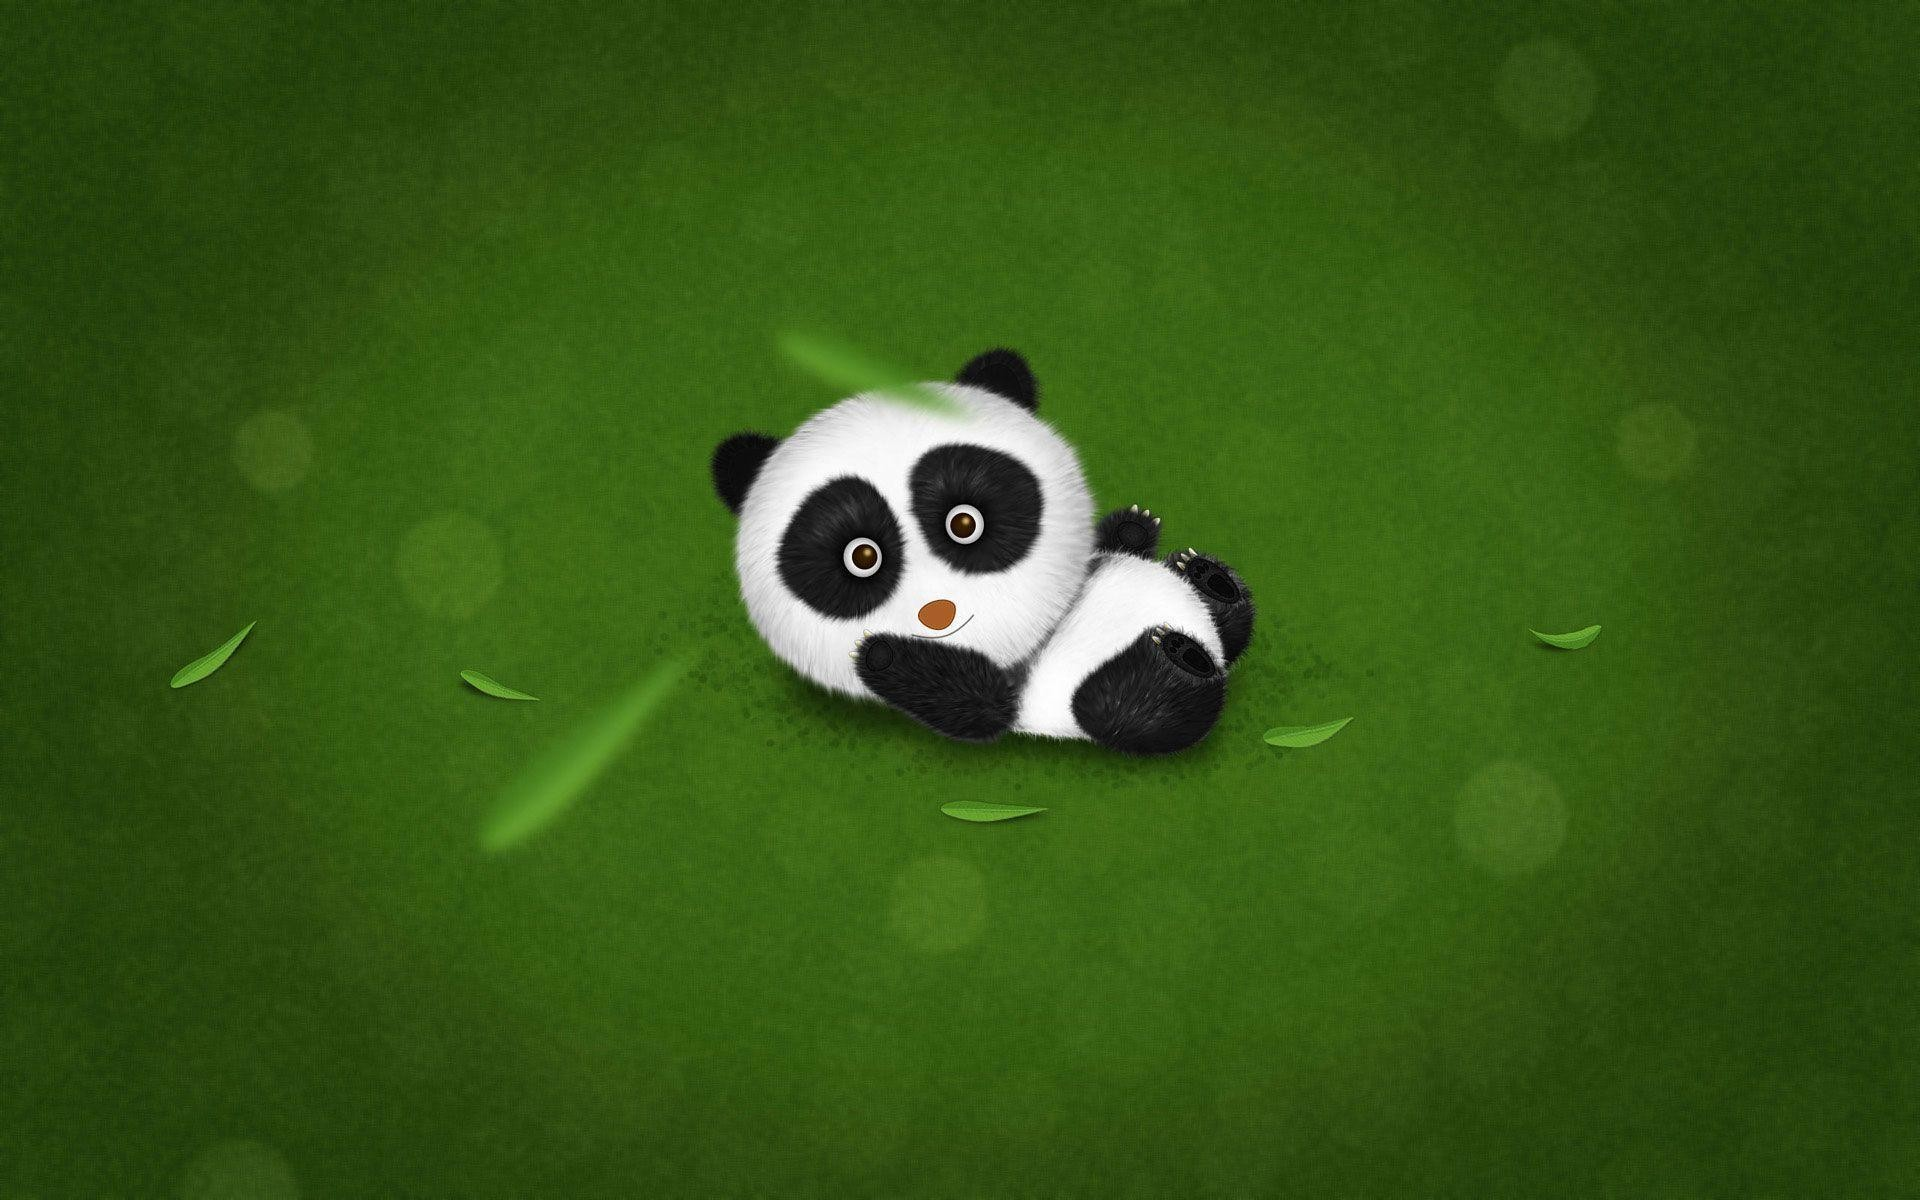 hinh gau truc panda 22